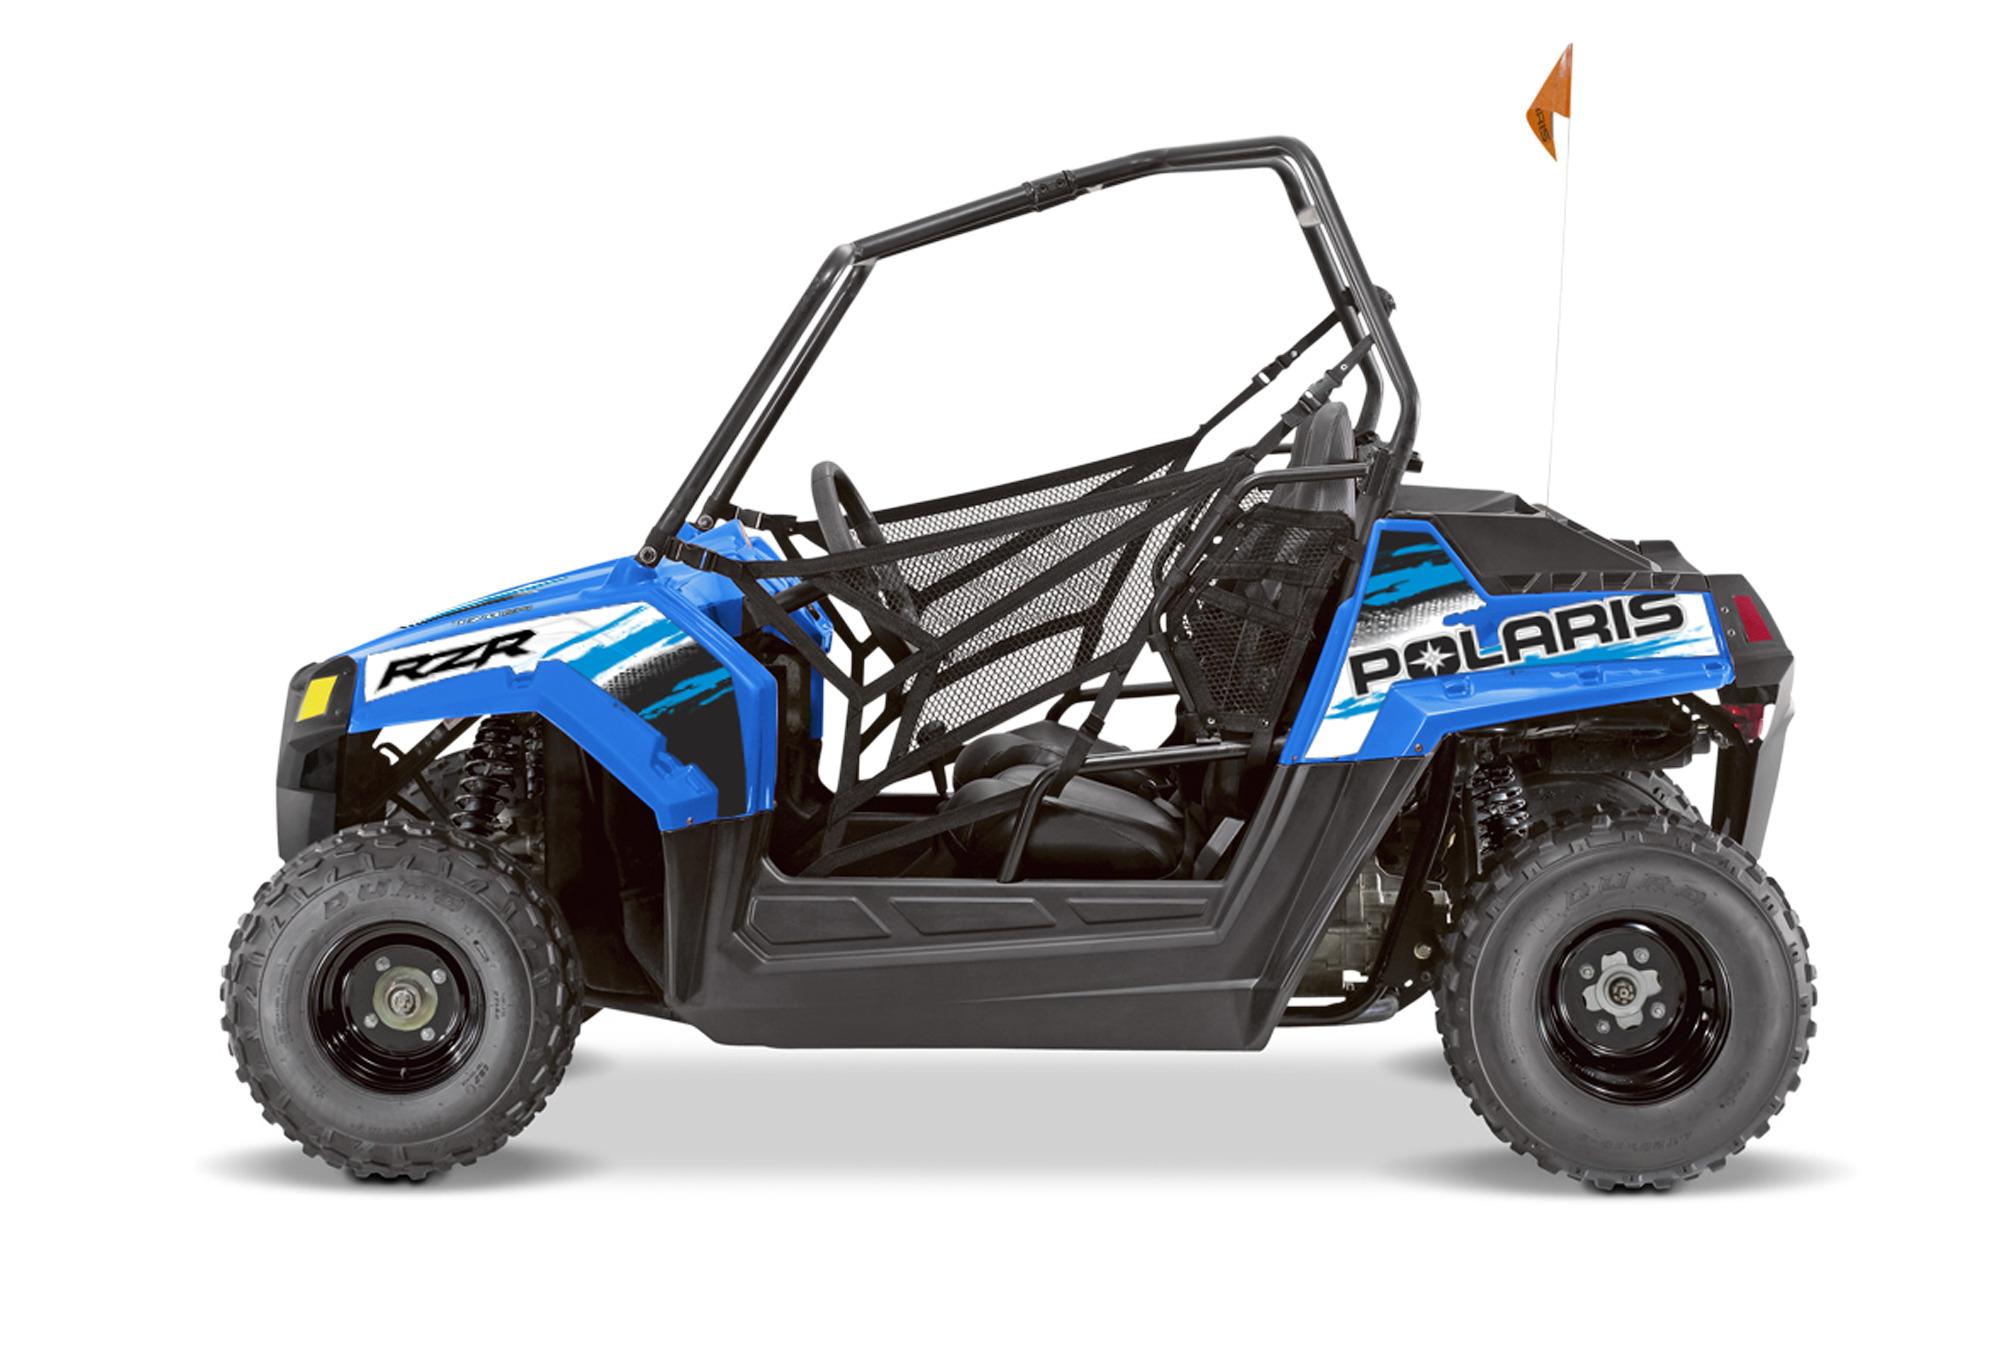 polaris recalls rzr 170 recreational off highway vehicles due to 2014 polaris rzr 170 wiring diagram [ 2000 x 1362 Pixel ]